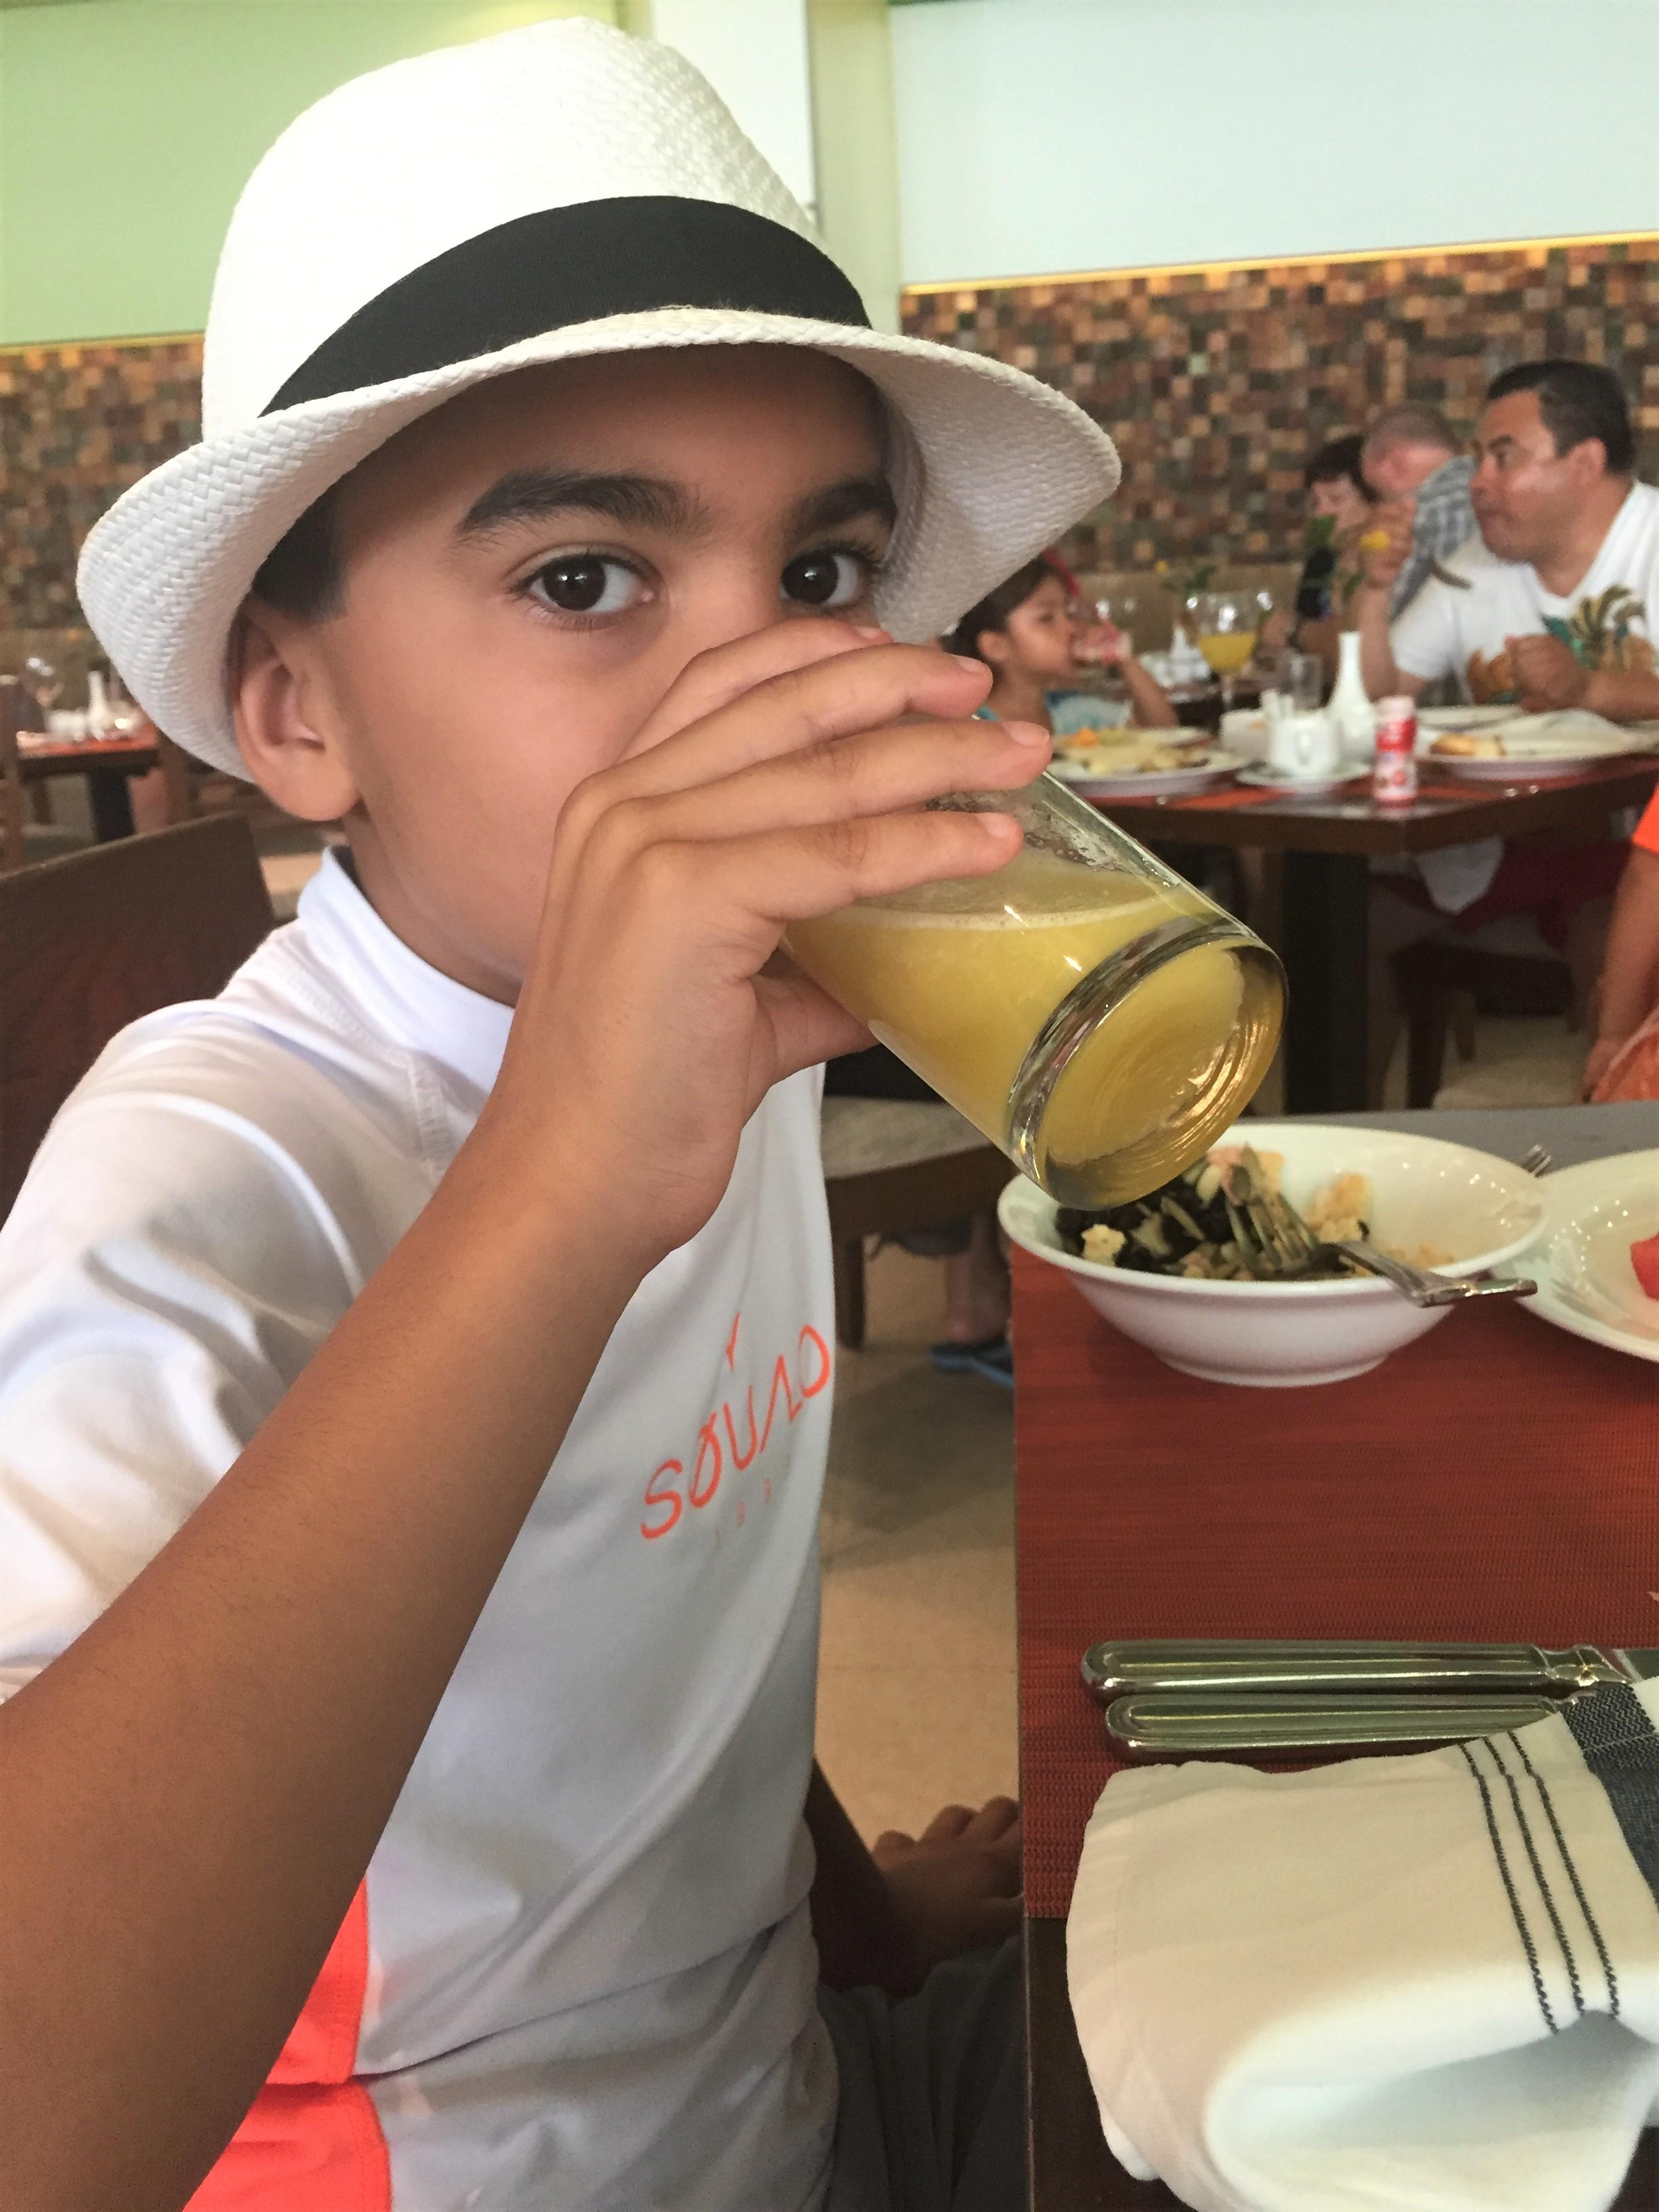 our trip to mexico, family trip to mexico, family vacation, family travel, taslim jaffer writer